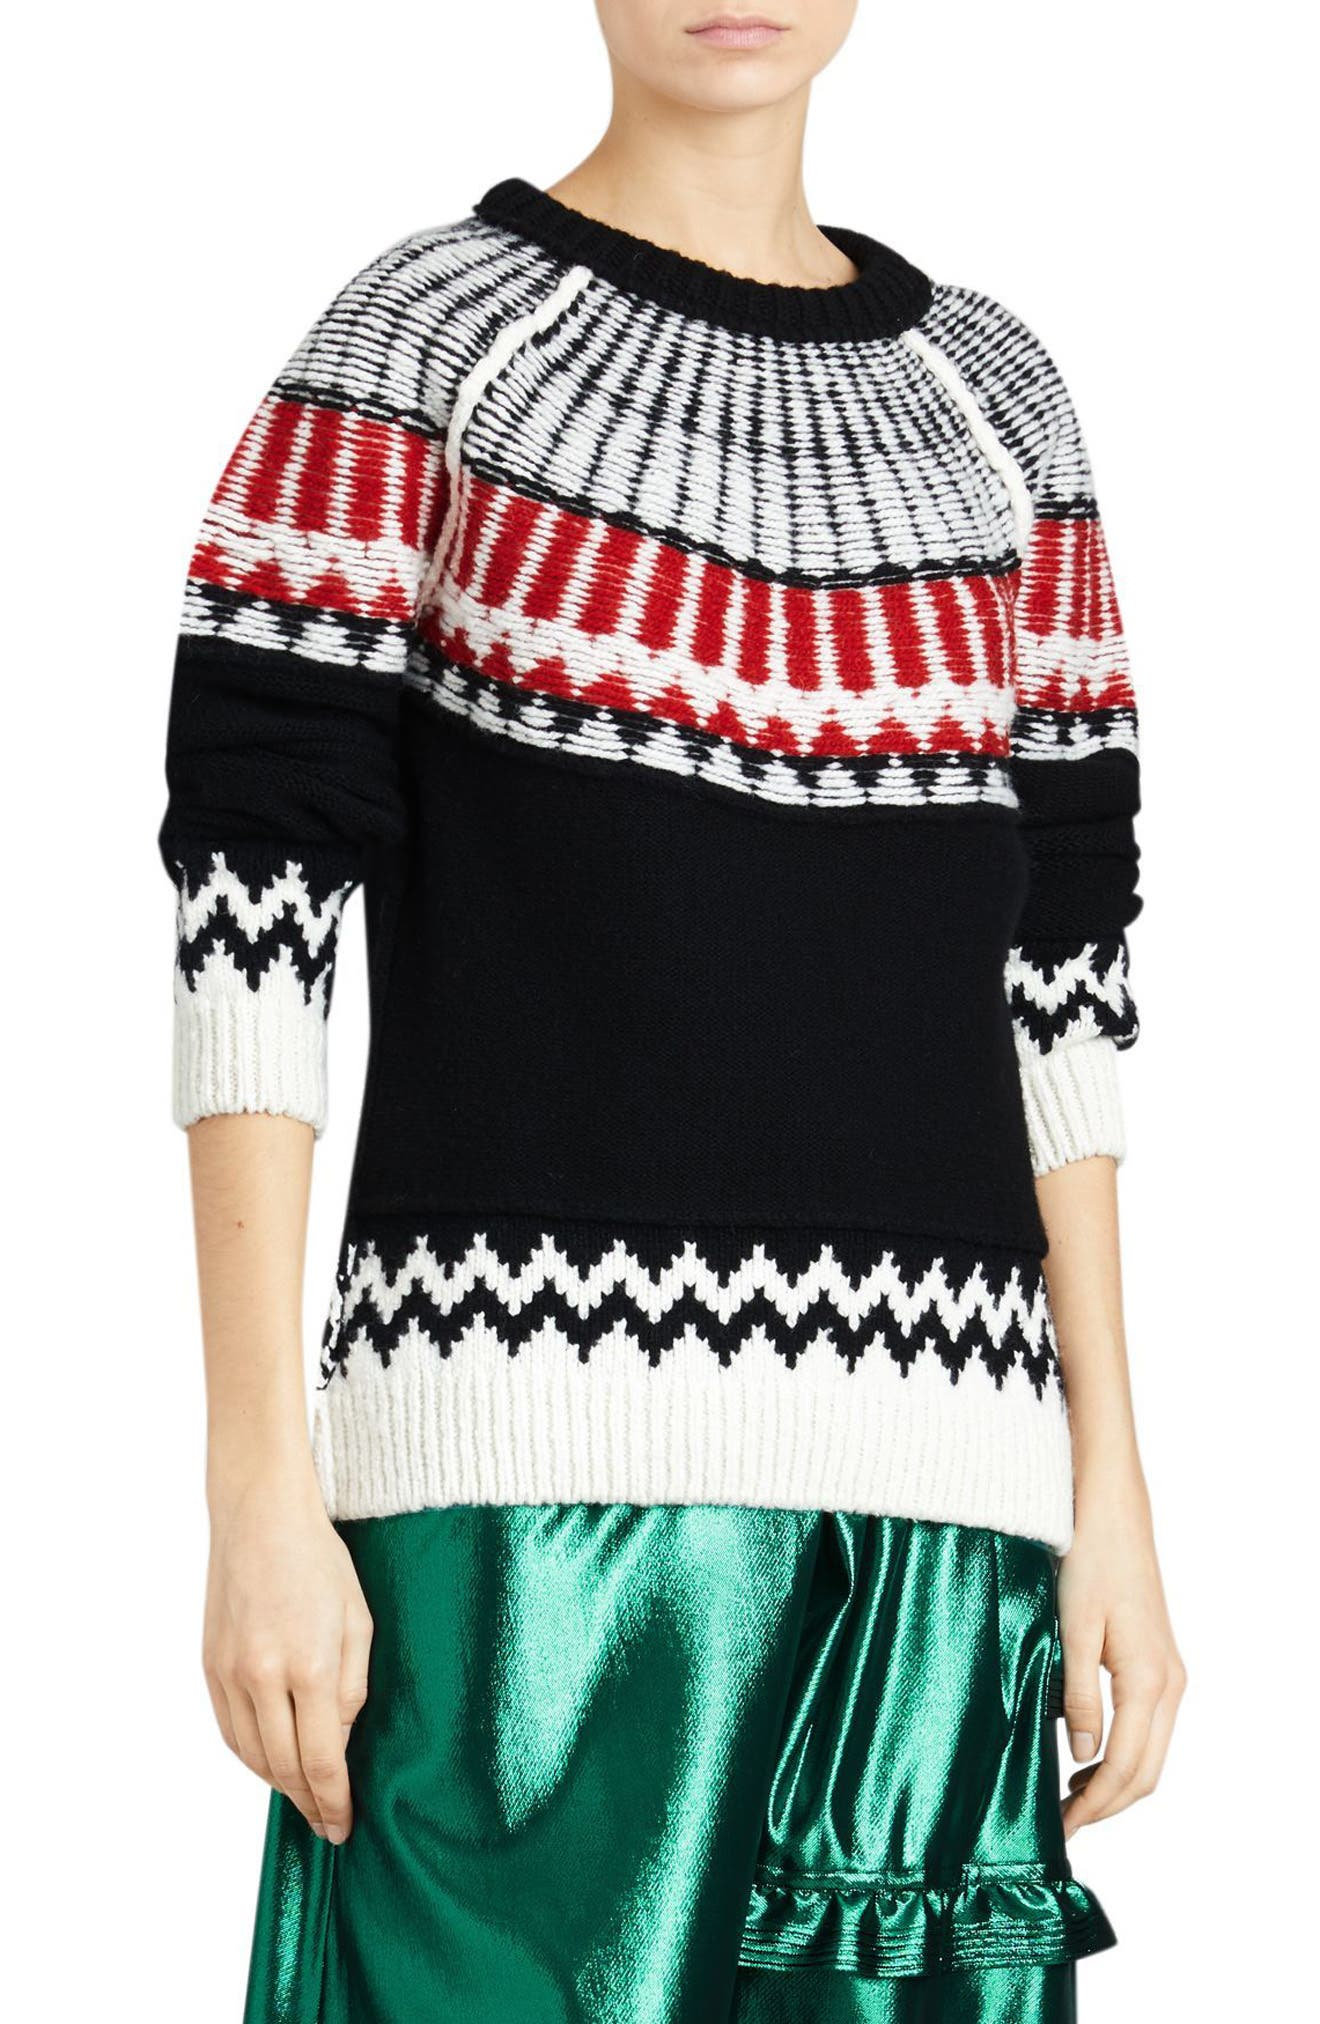 Trycroft Fair Isle Wool Blend Sweater,                             Main thumbnail 1, color,                             Black/ Military Red